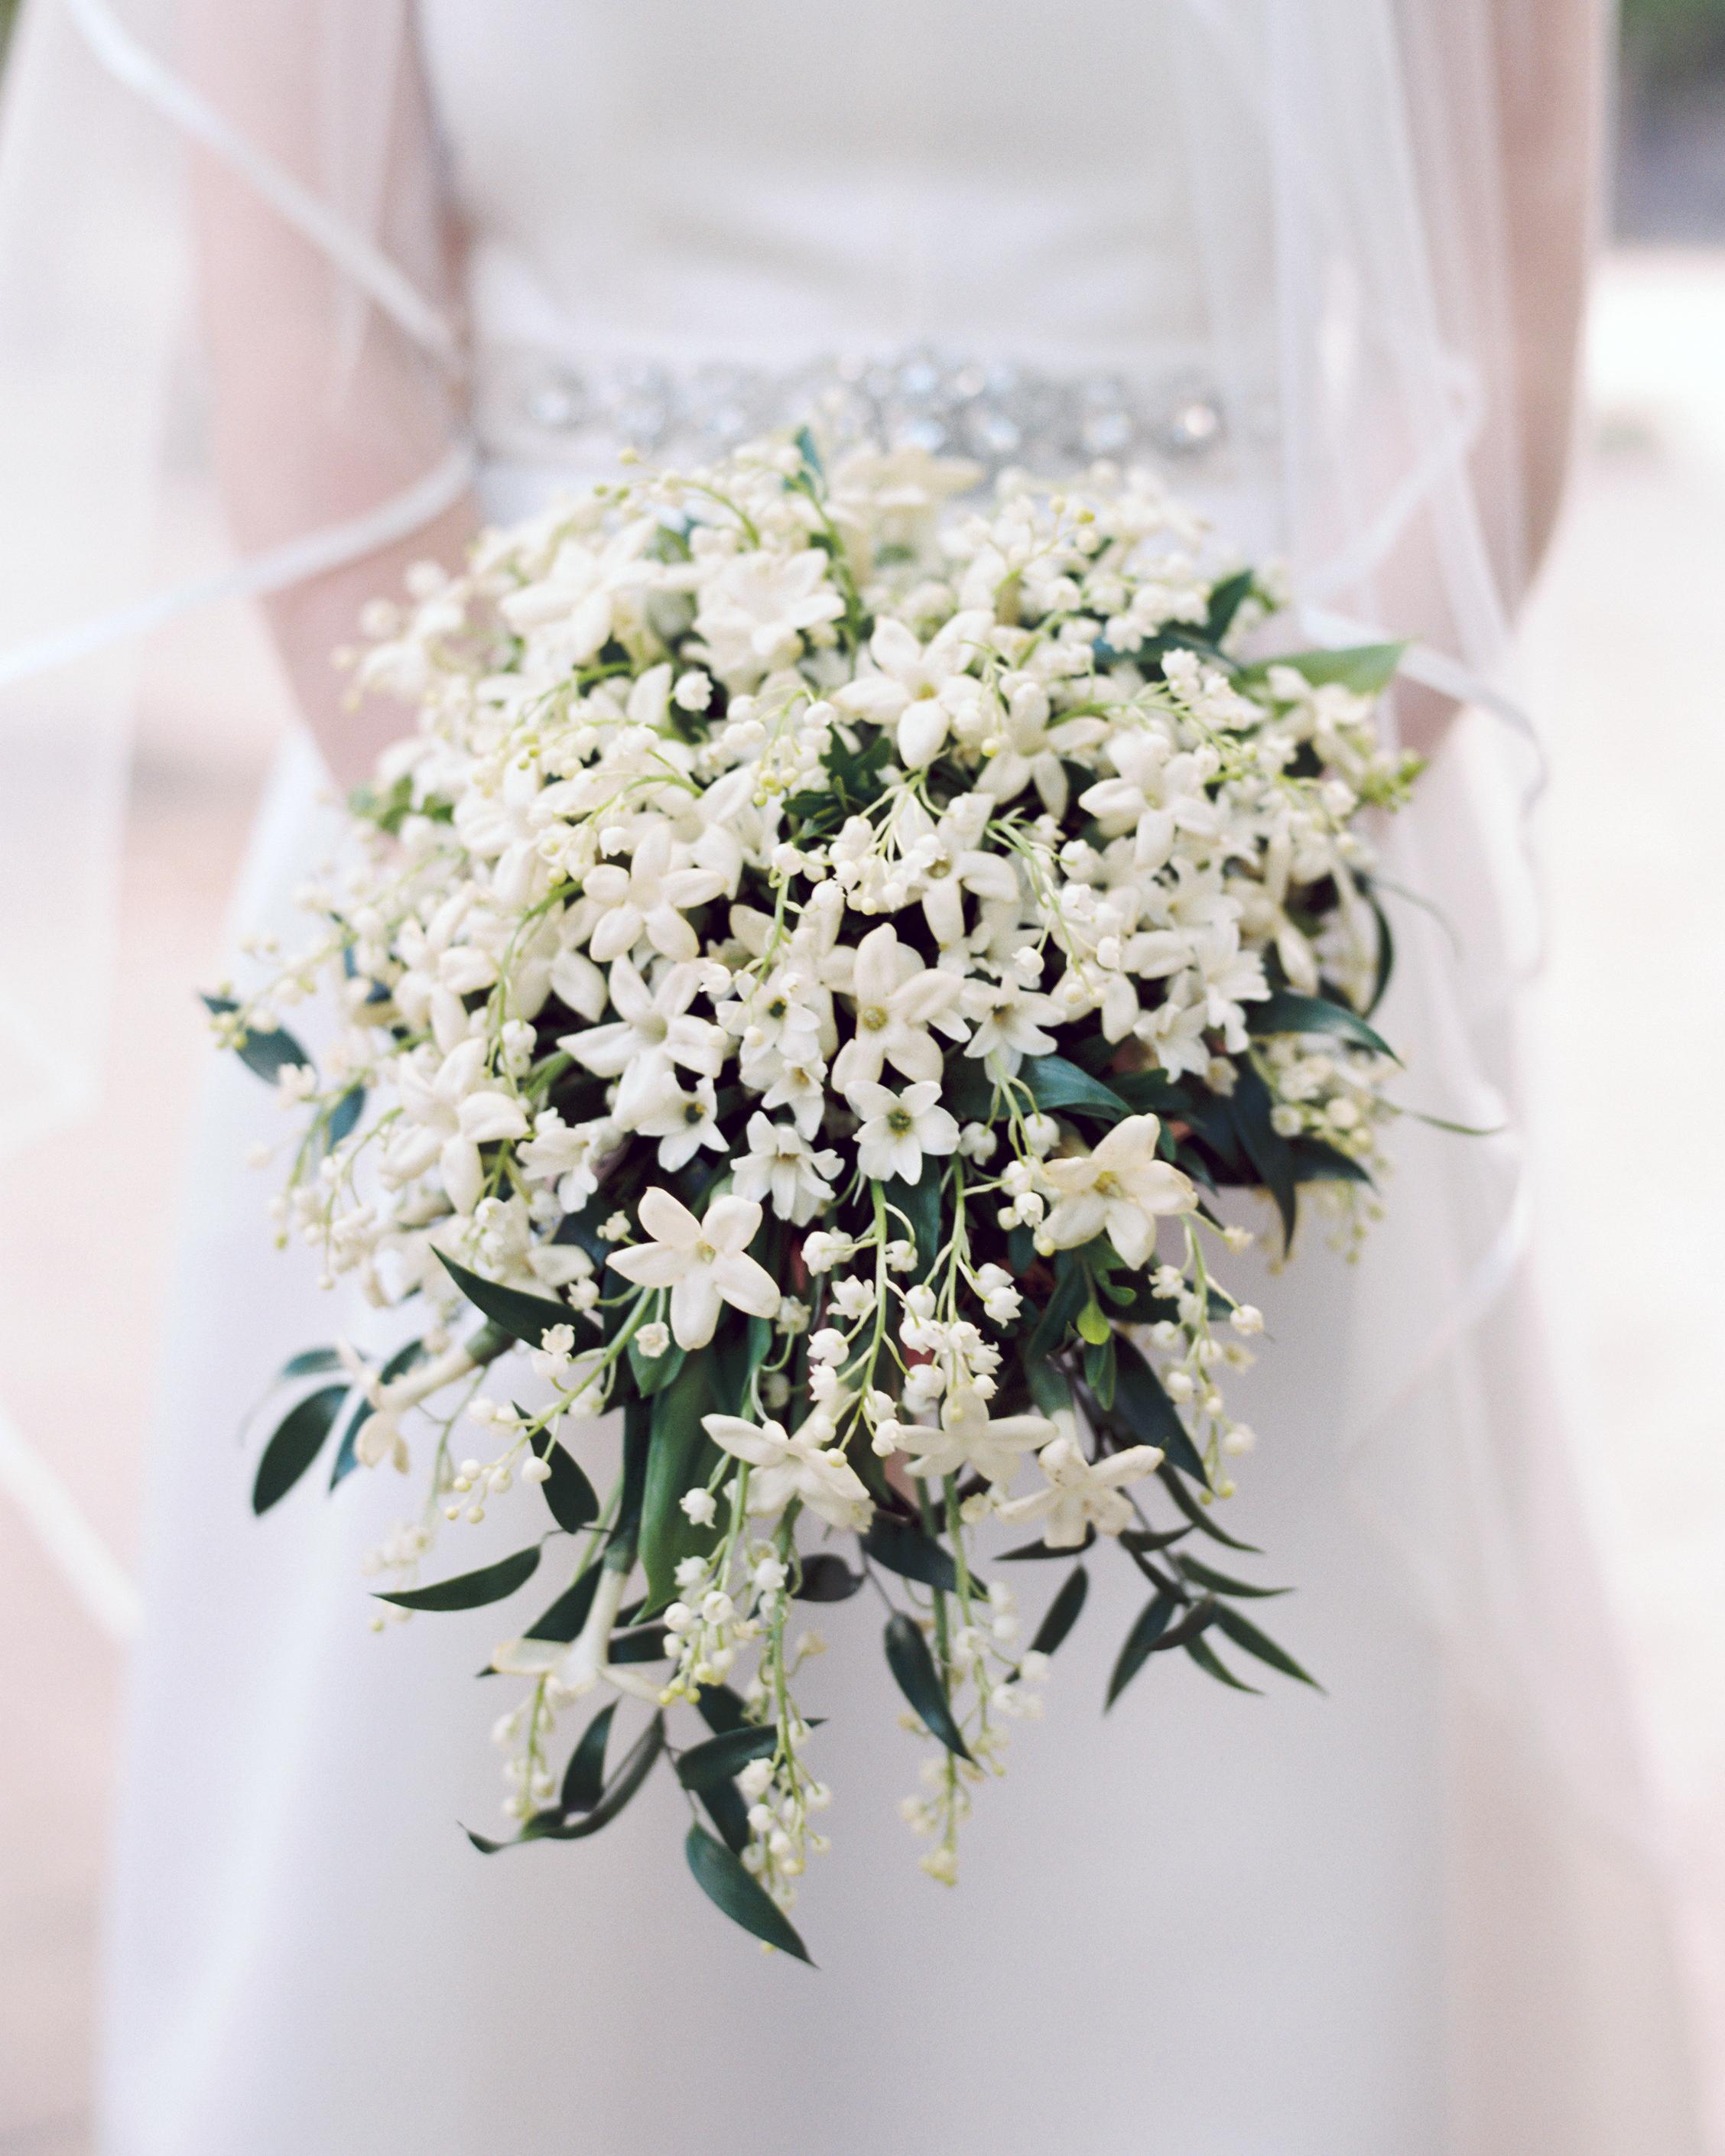 taylor-john-wedding-bouquet-311-s112507-0116.jpg